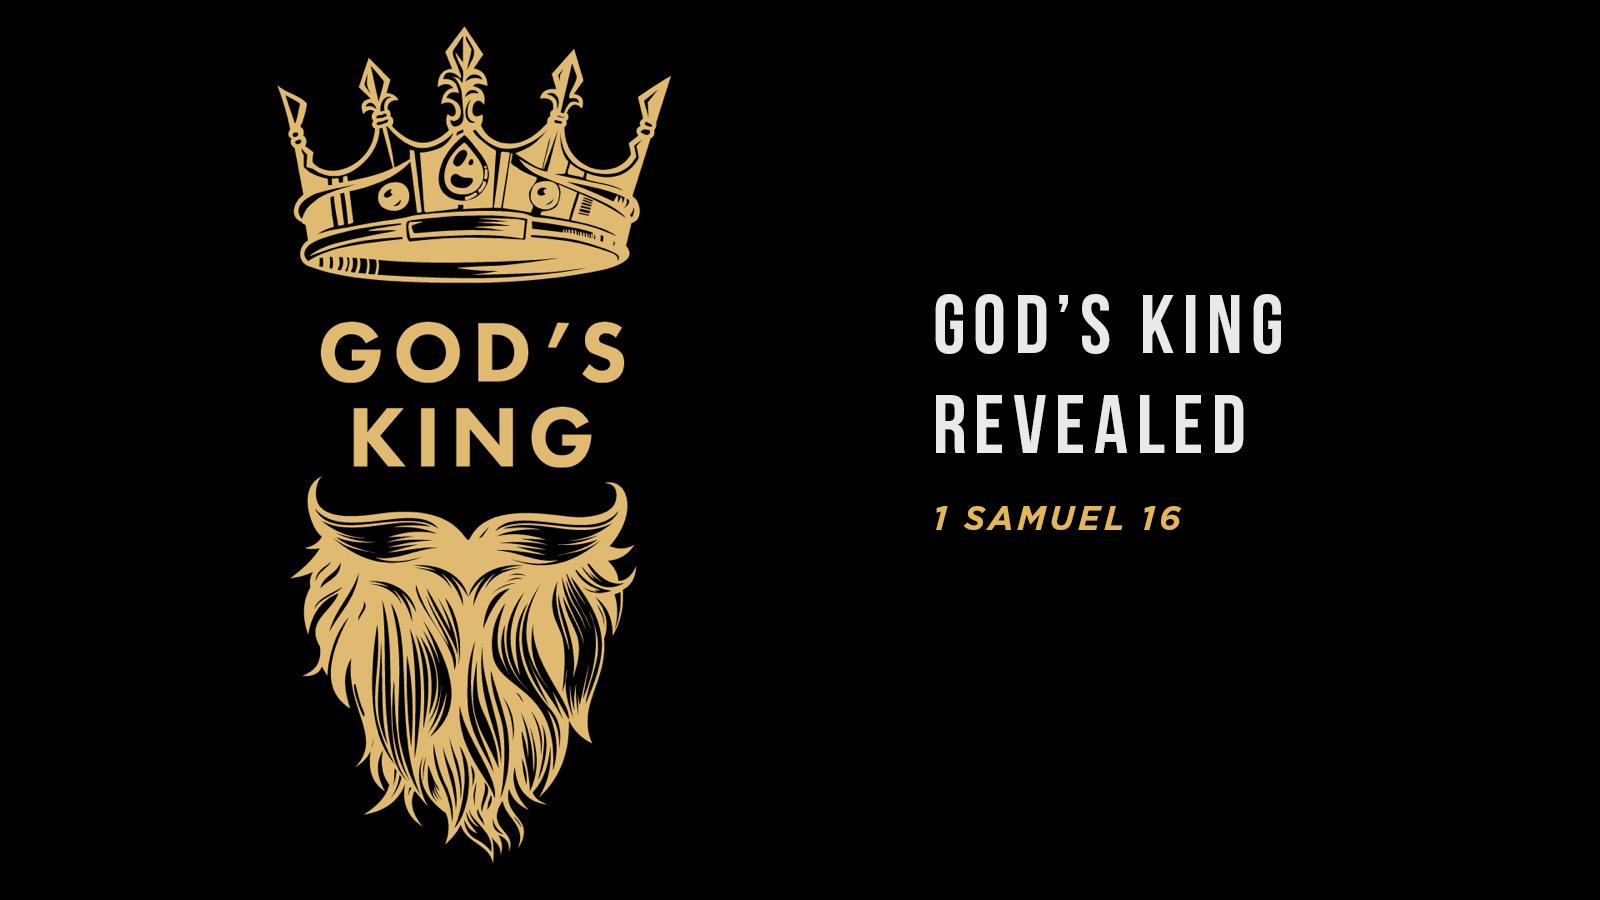 God's King Revealed